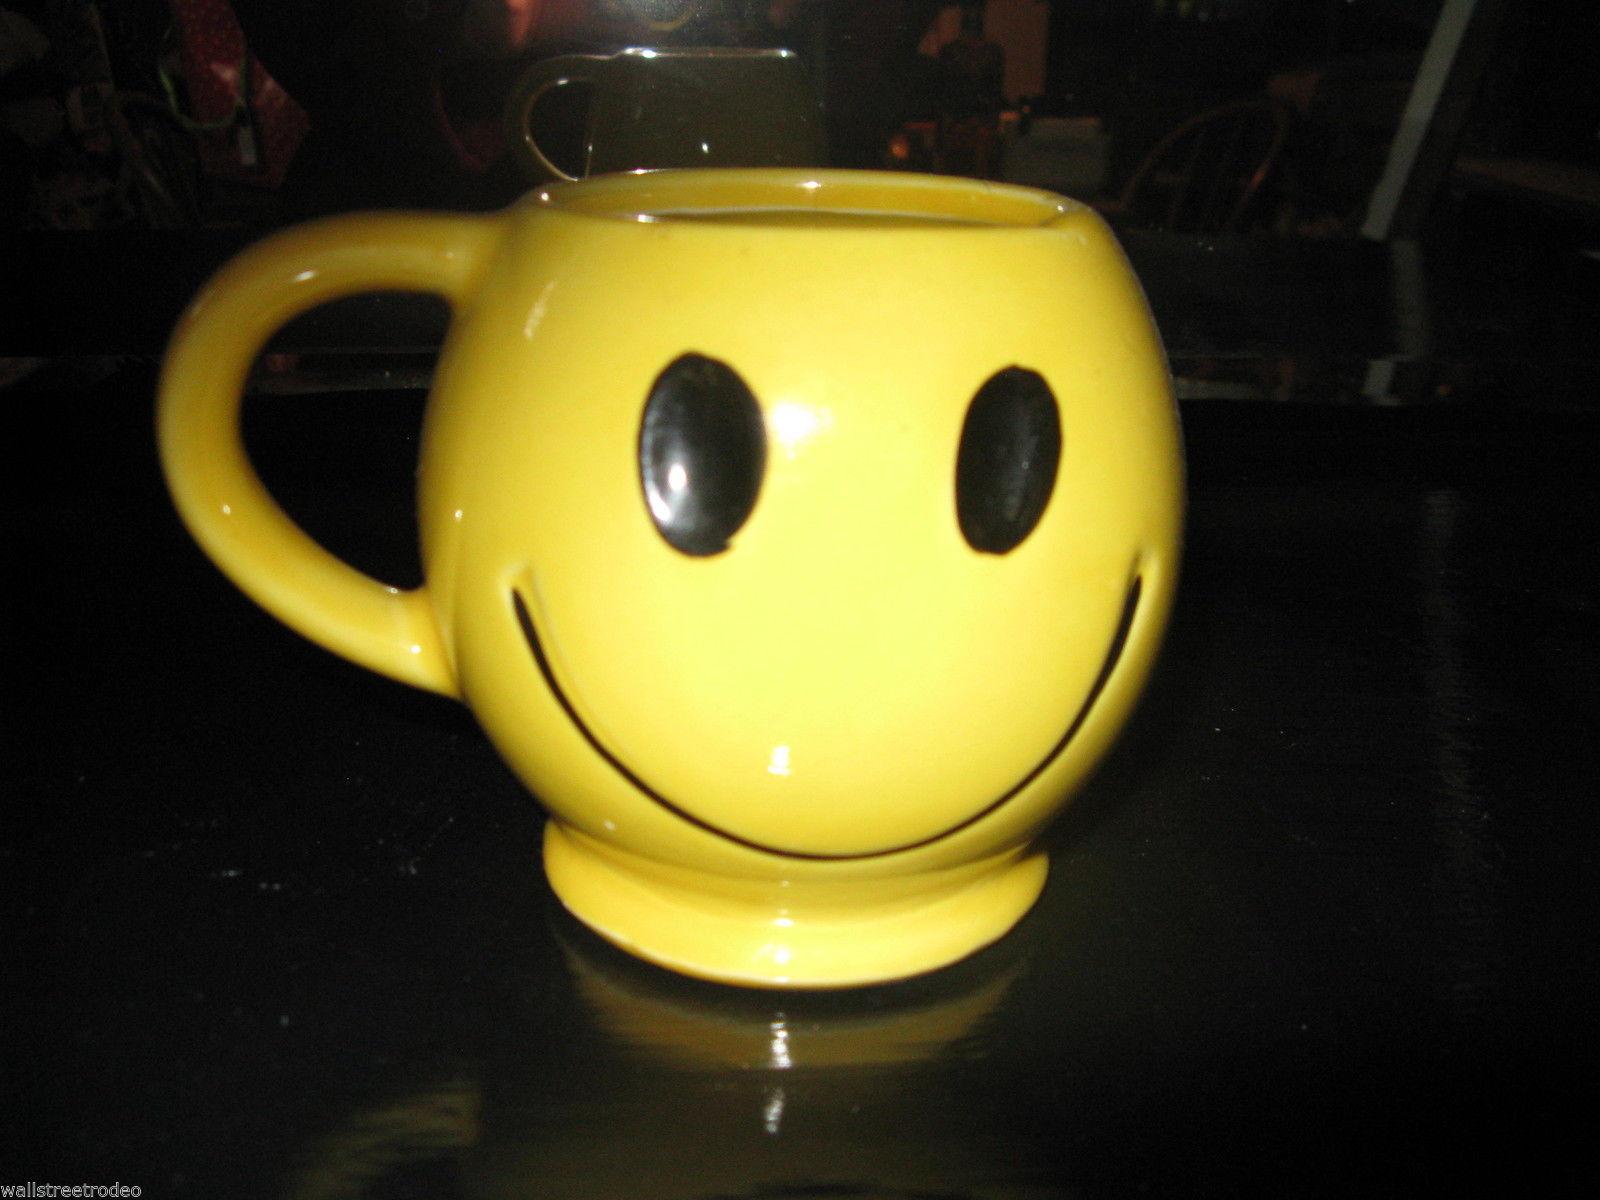 Vintage 70s 1970s McCoy Smiley Face ceramic Coffee Cup Mug USA